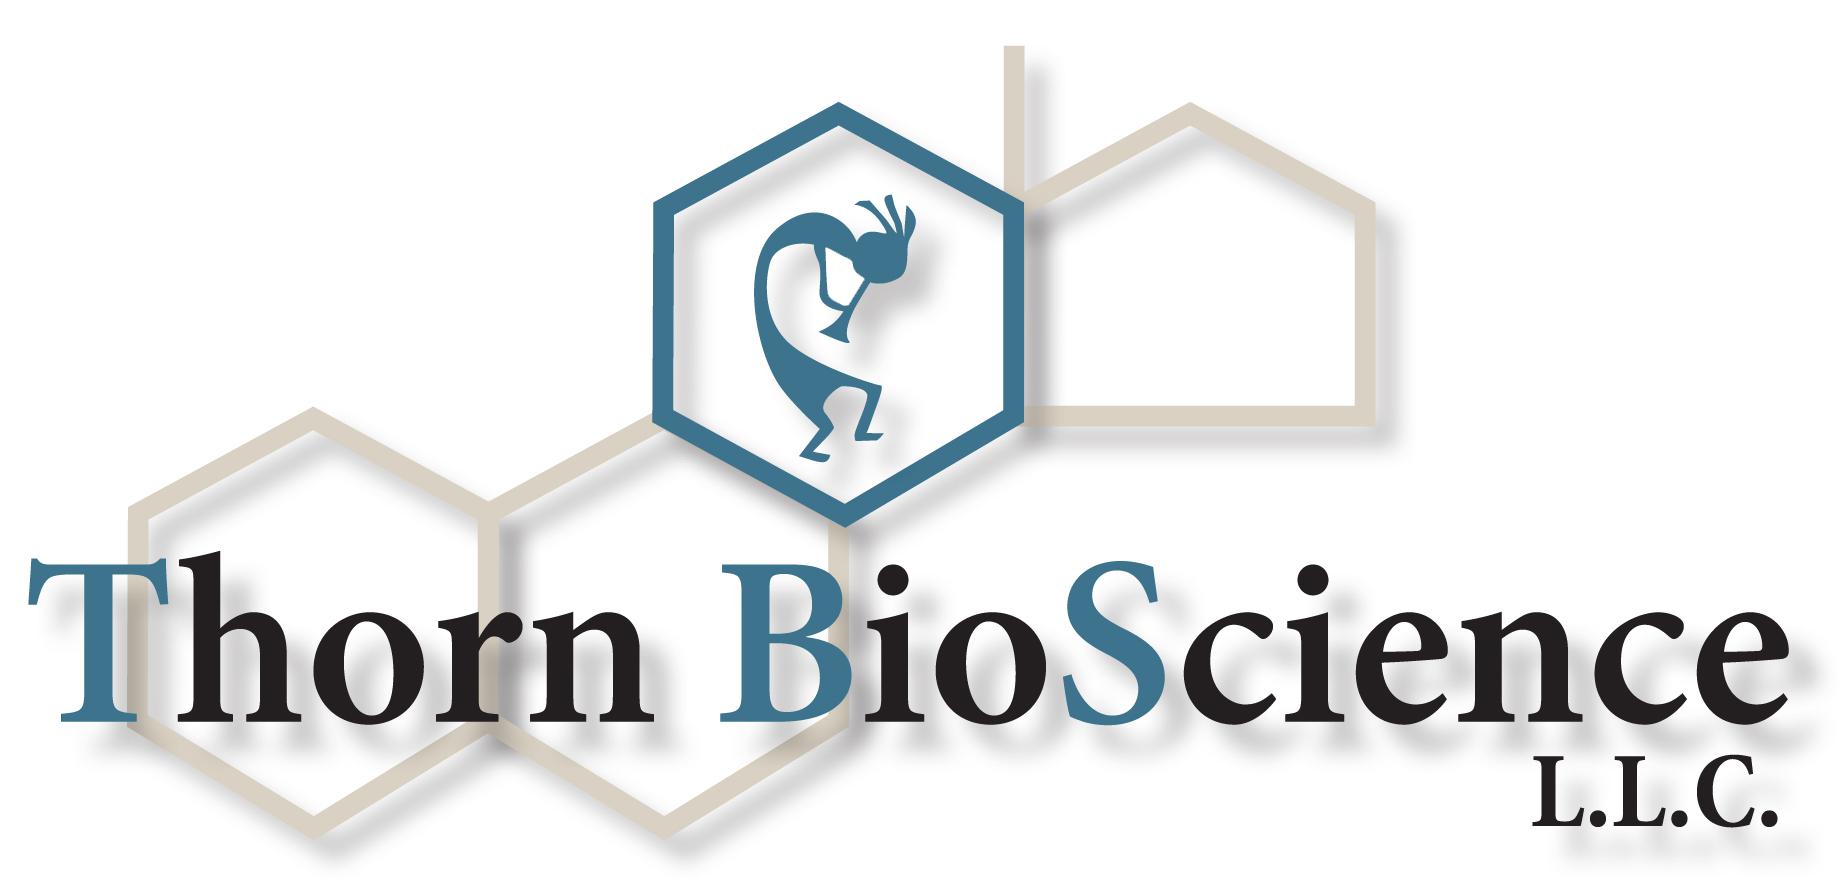 Thorn BioScience